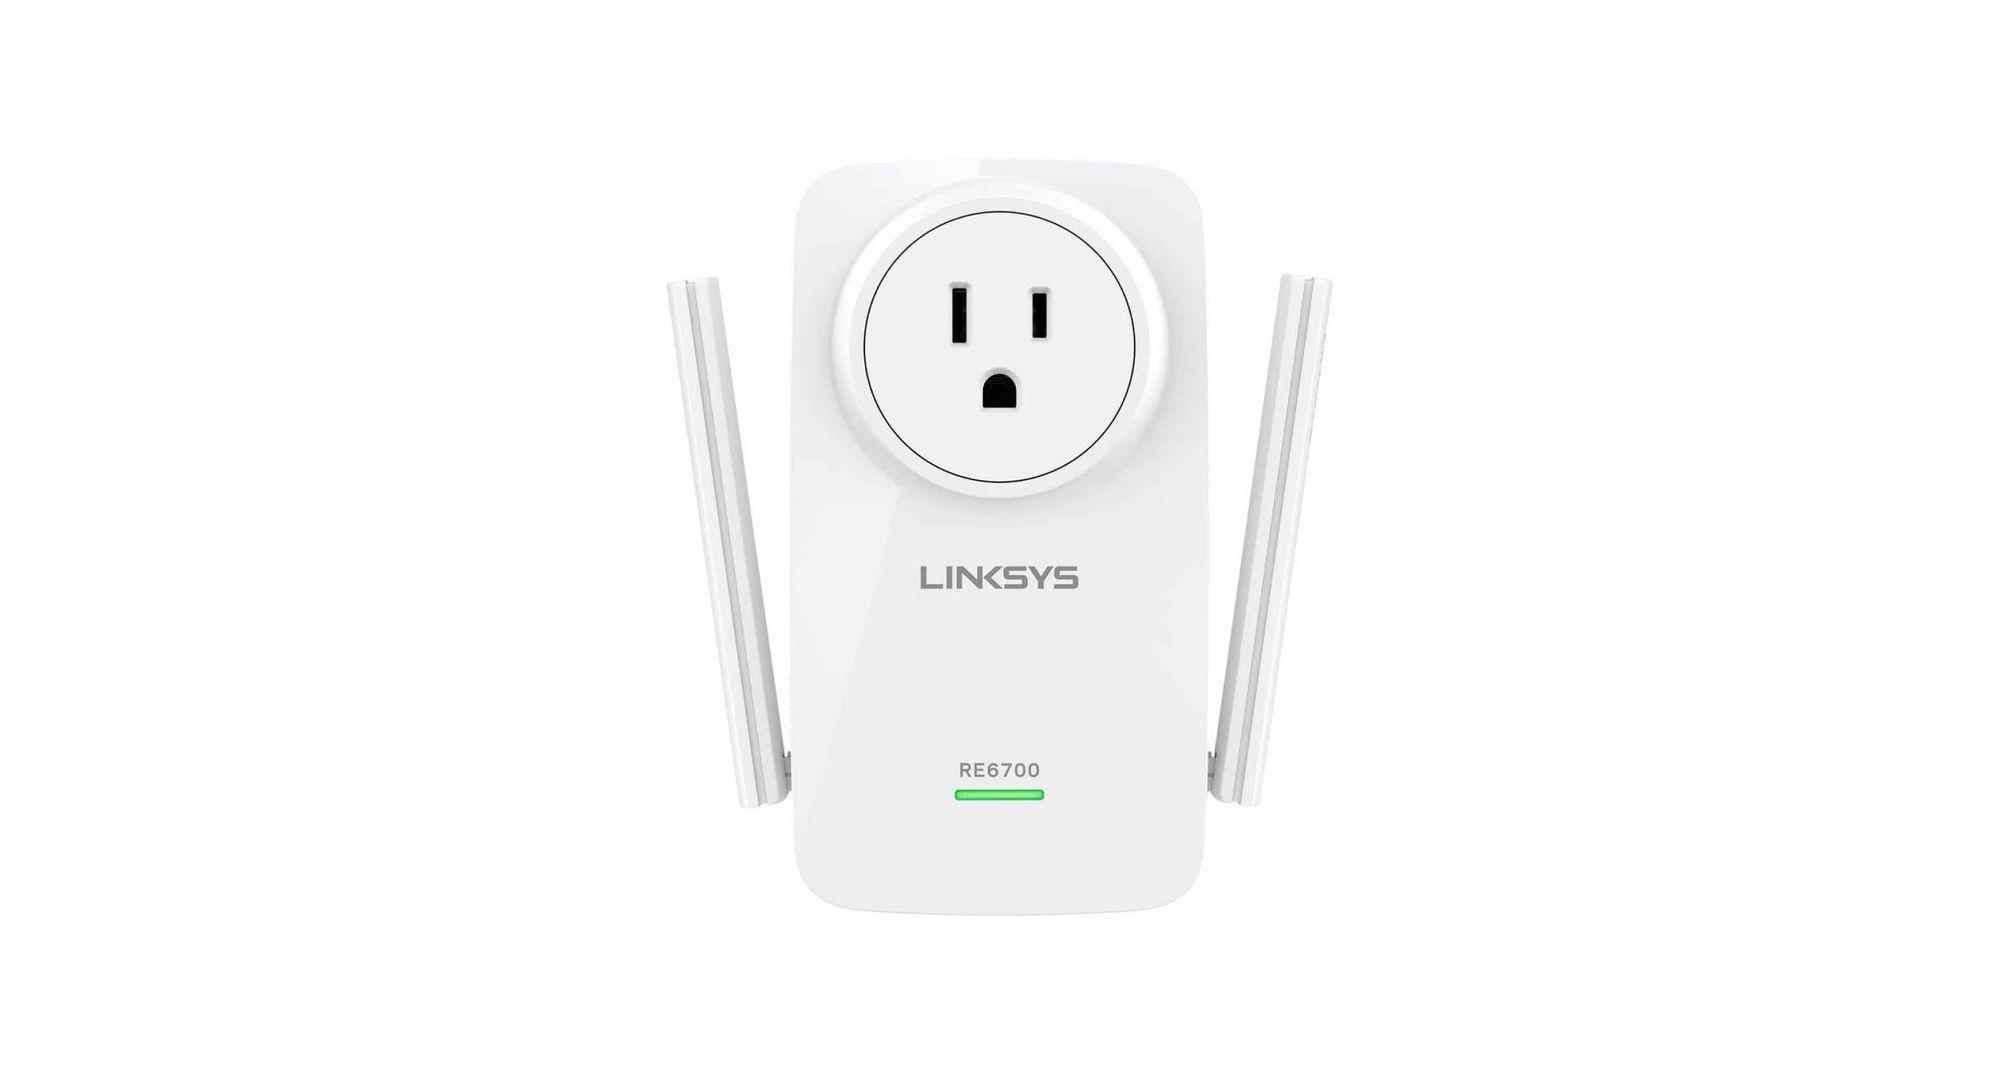 linksys-ac1200-wifi-range-extender